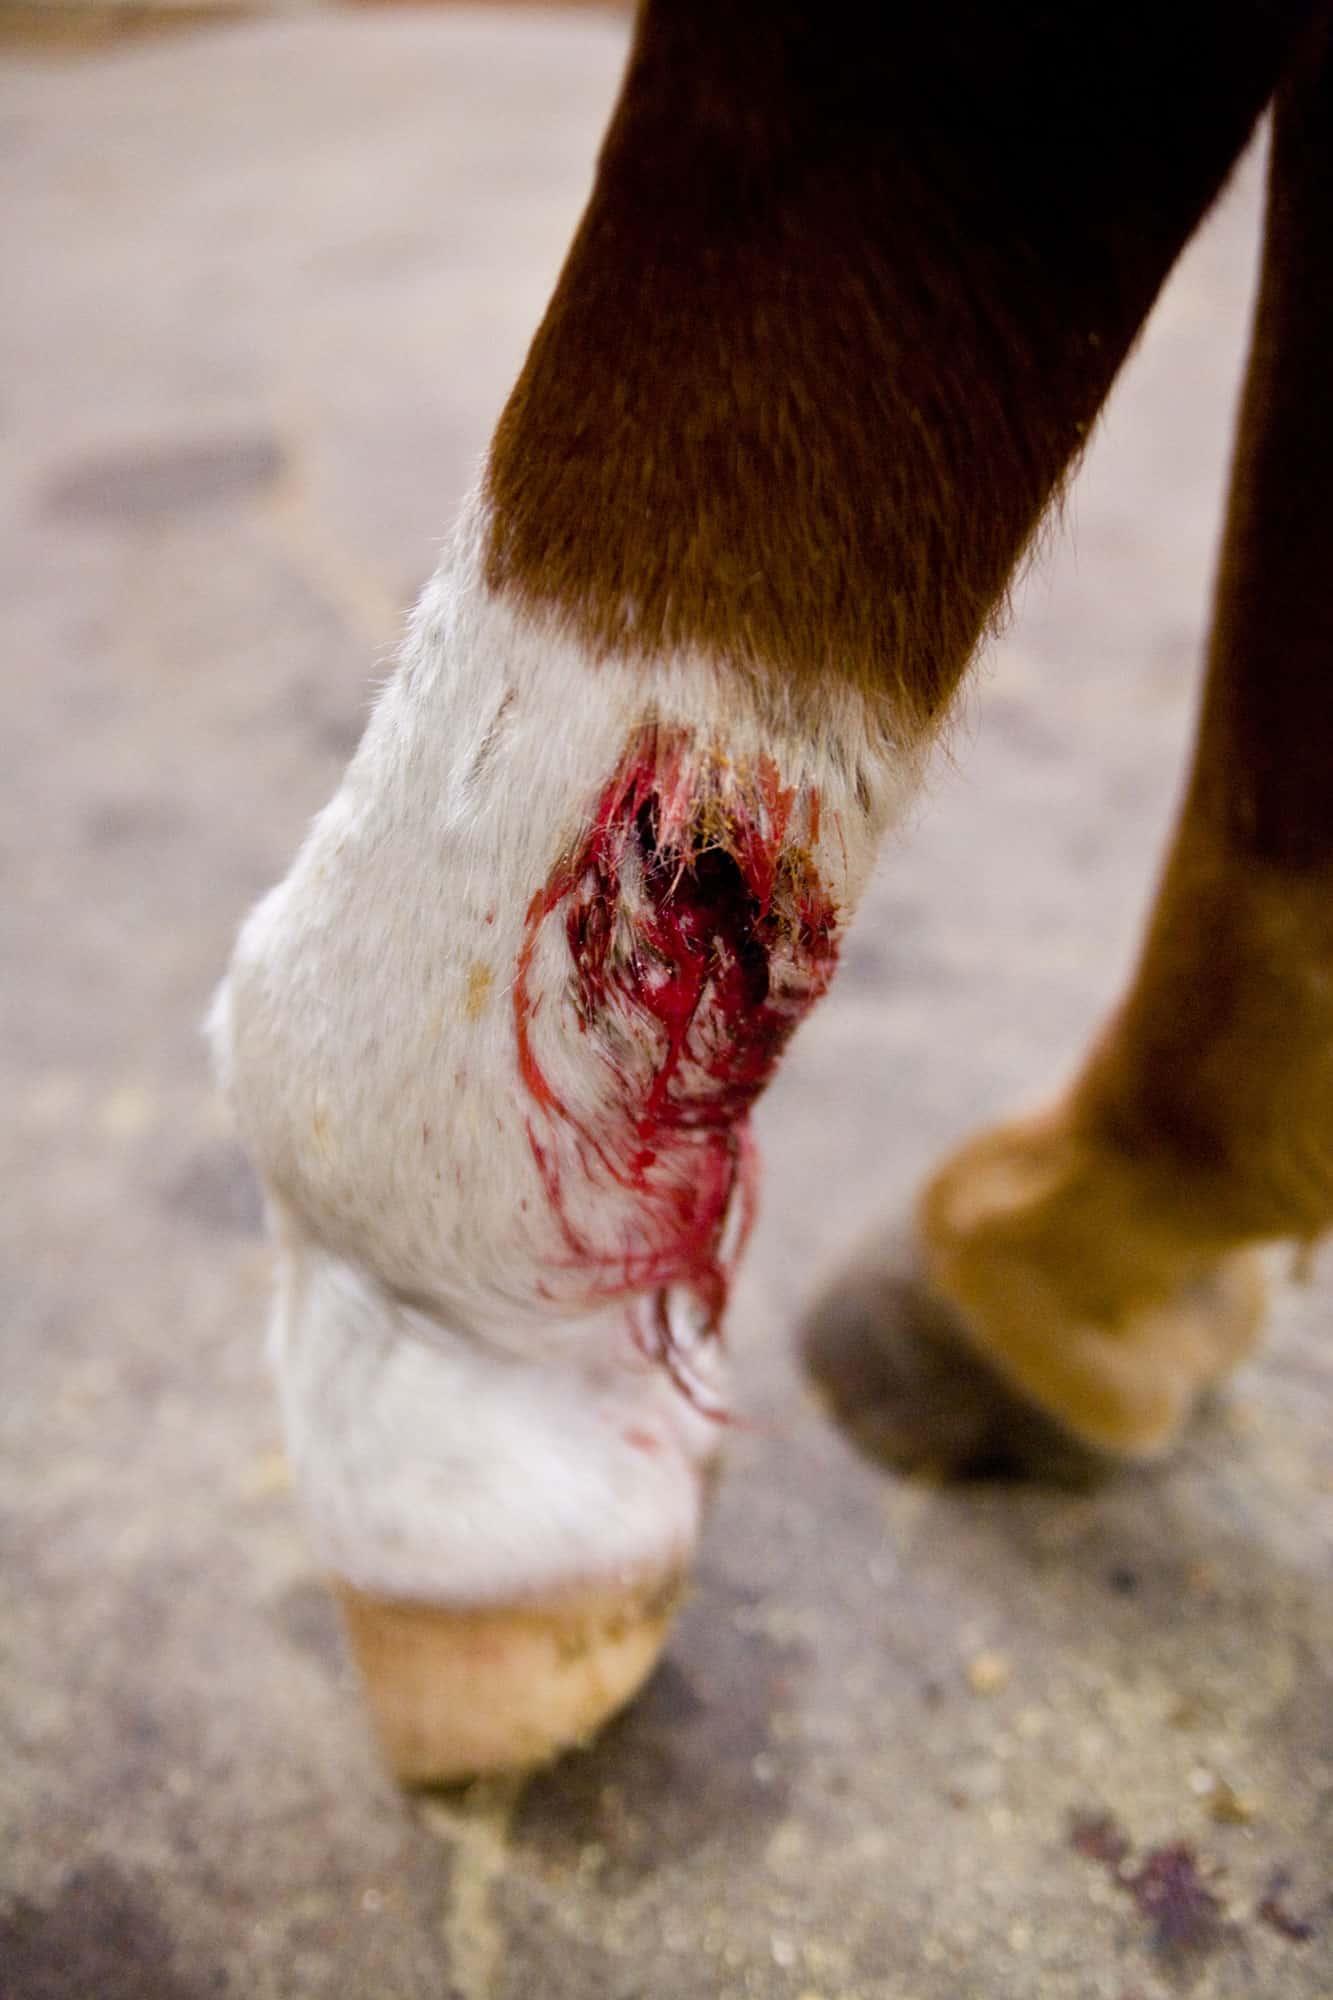 Fresh Horse Leg Wound